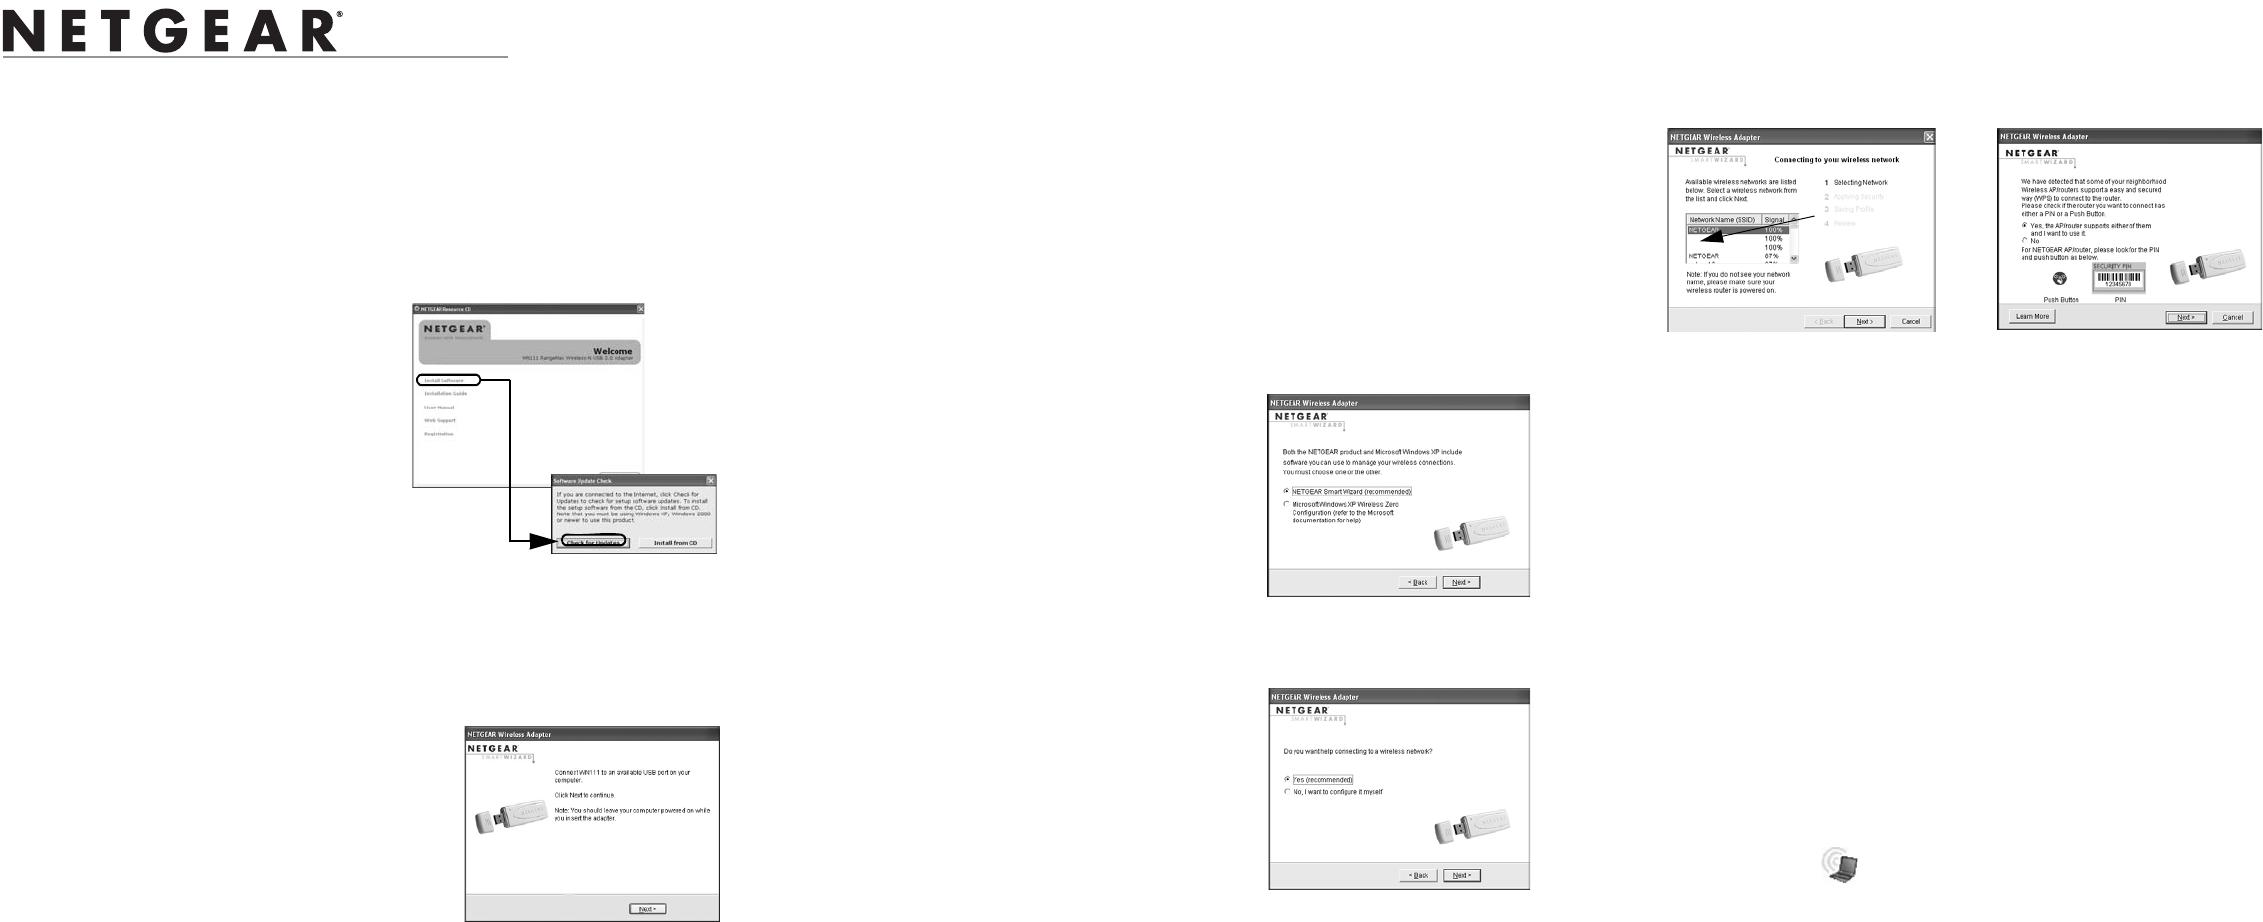 Handleiding Netgear WN111v2 (pagina 1 van 2) (English)